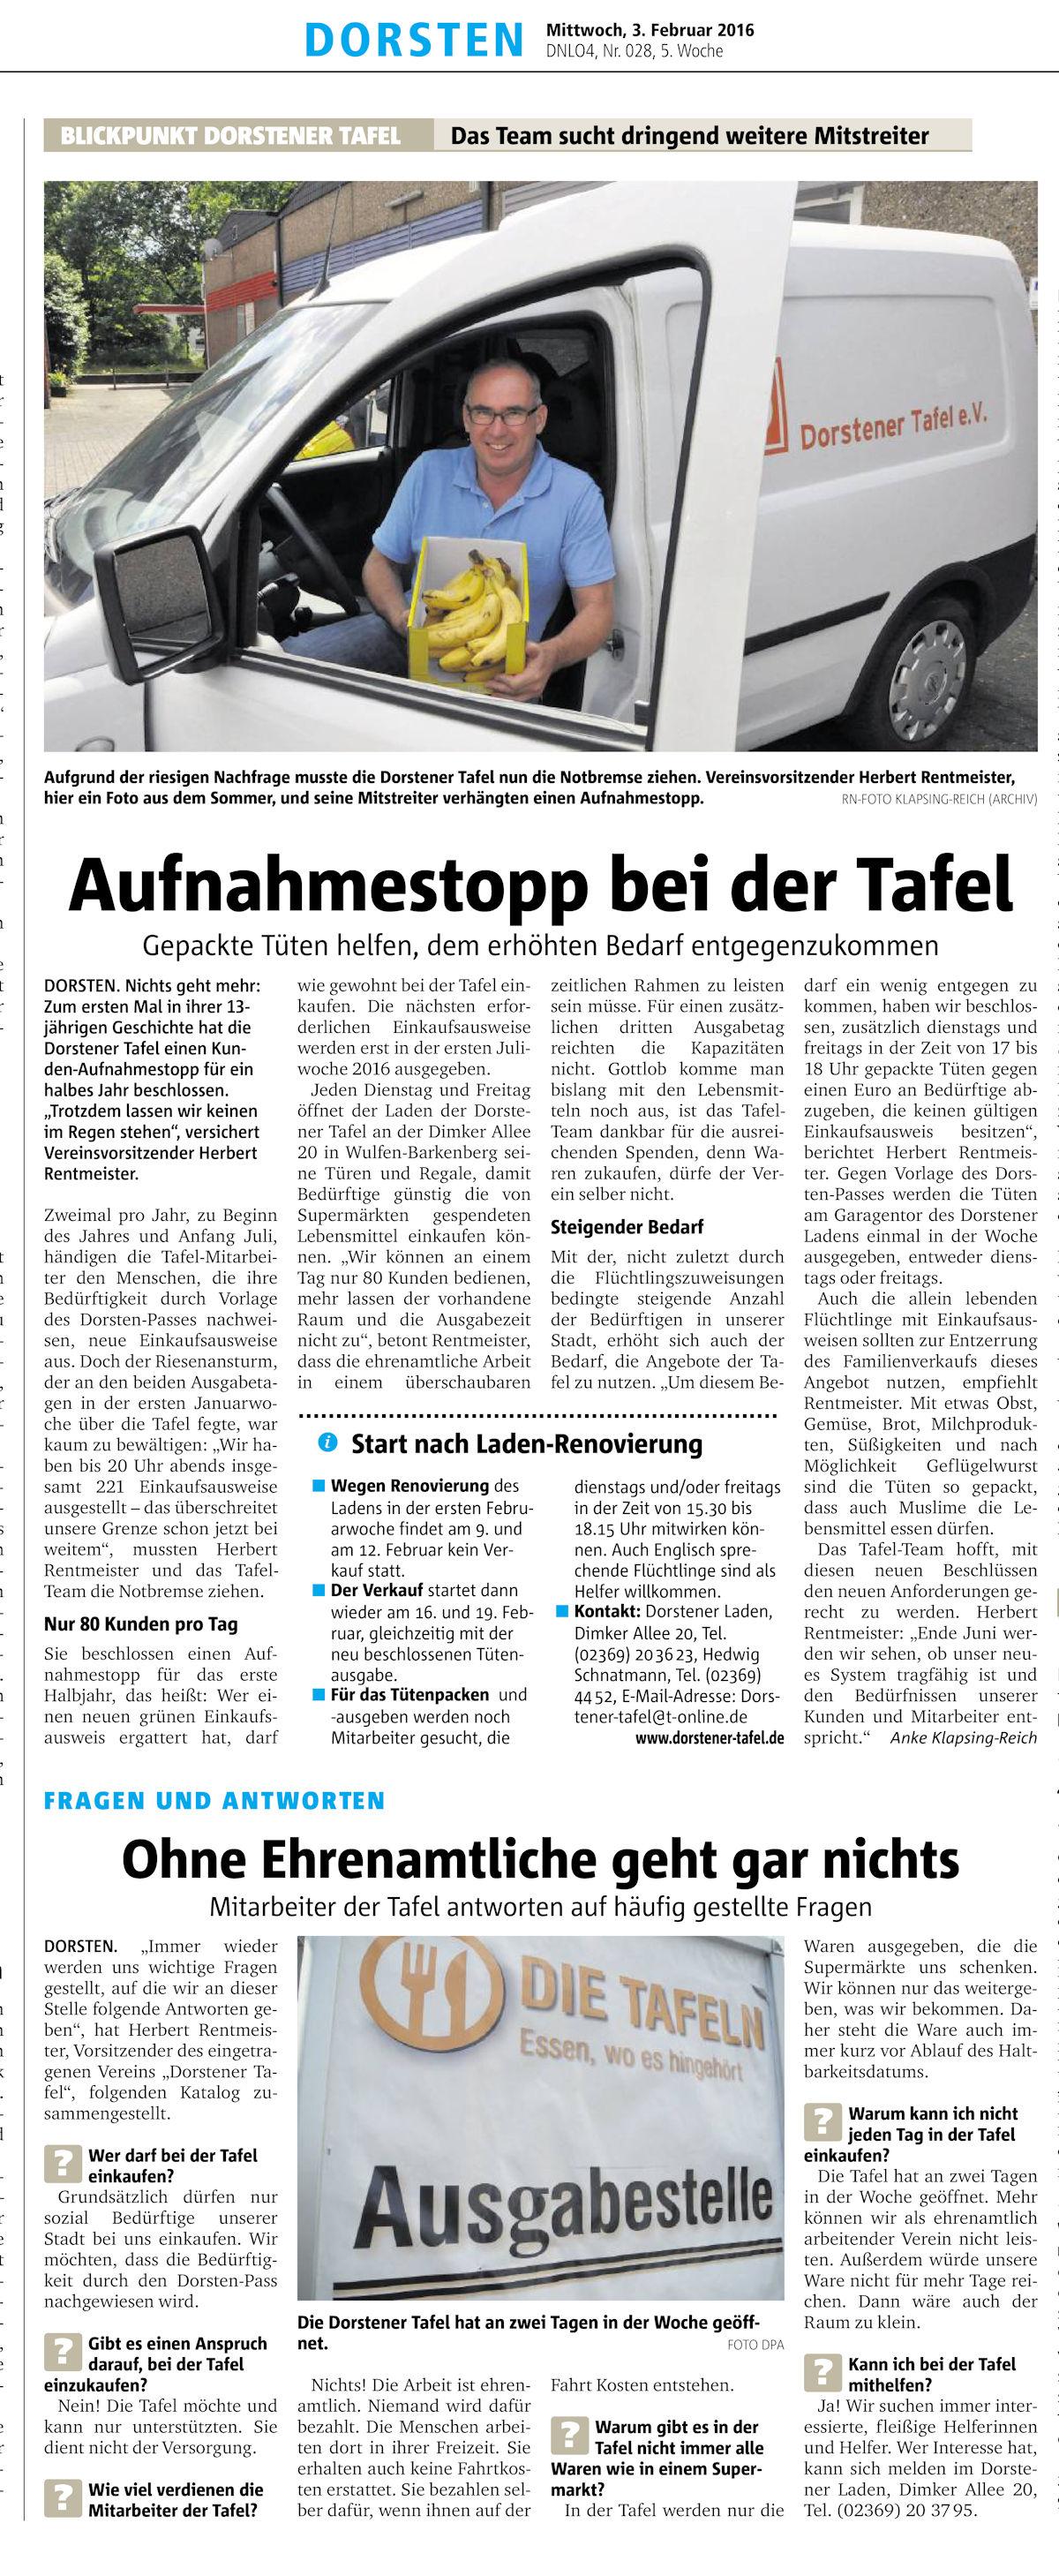 2016-02-03-Aufnahmestopp-Medienhaus Lensing_E-Paper-Ausgabe_RN DN-Dorsten_Mittwoch, 3 Februar 2016 (1)-1200